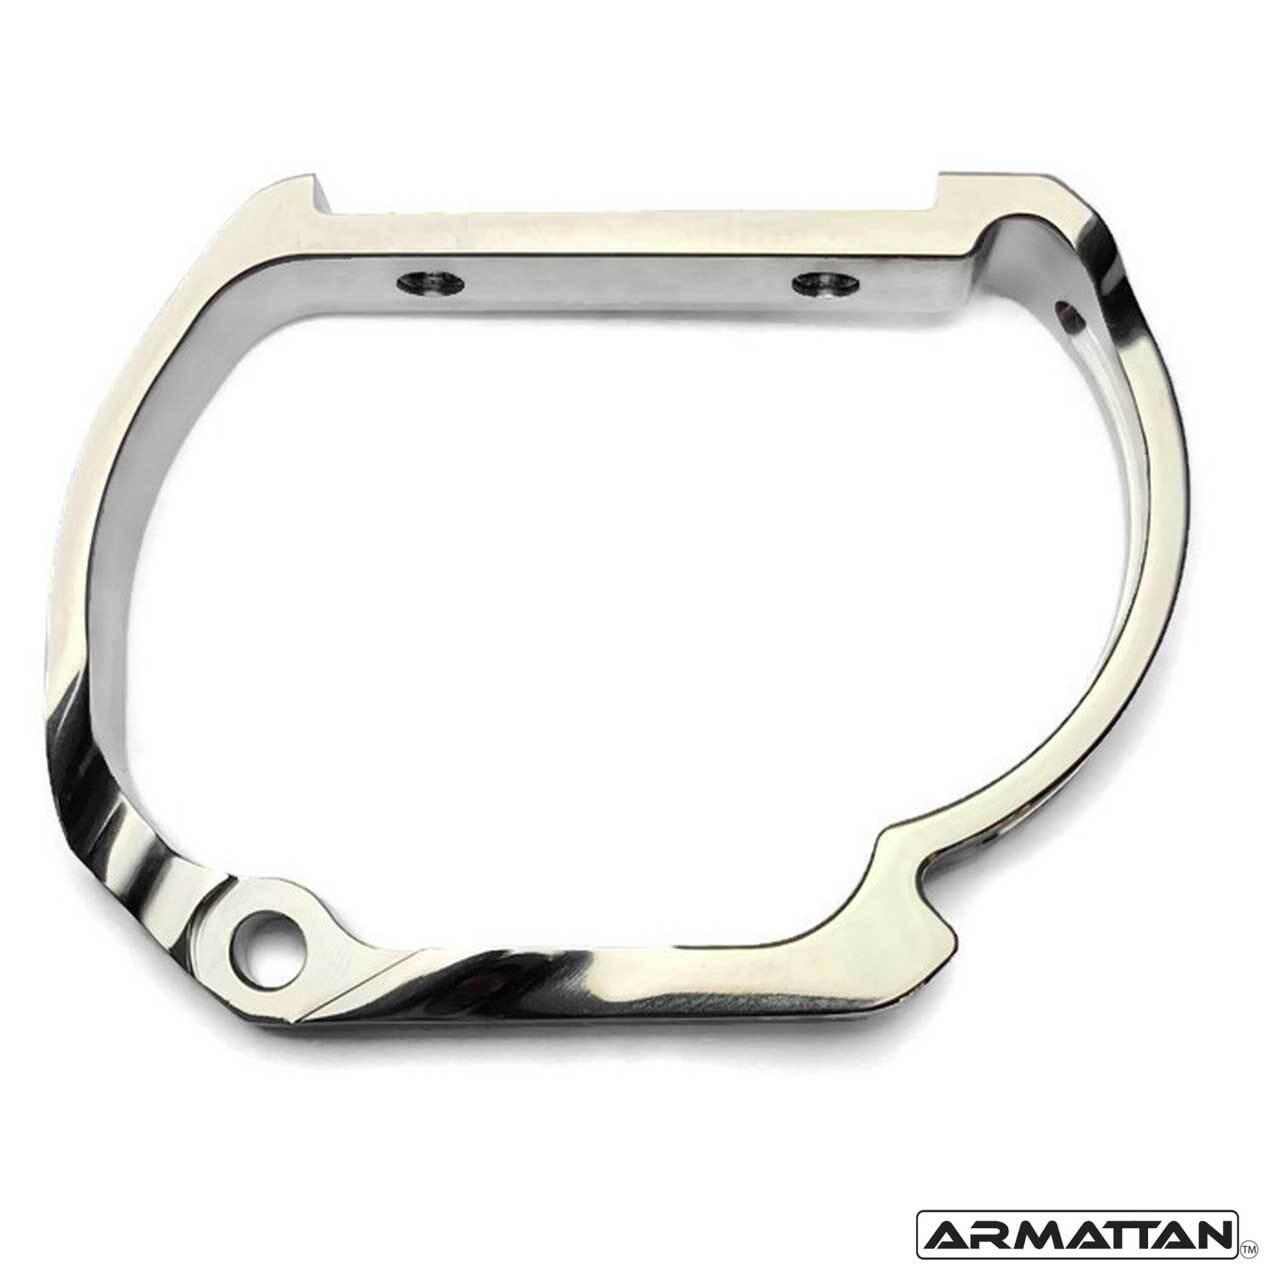 Armattan Marmotte 右 Brace/チタン